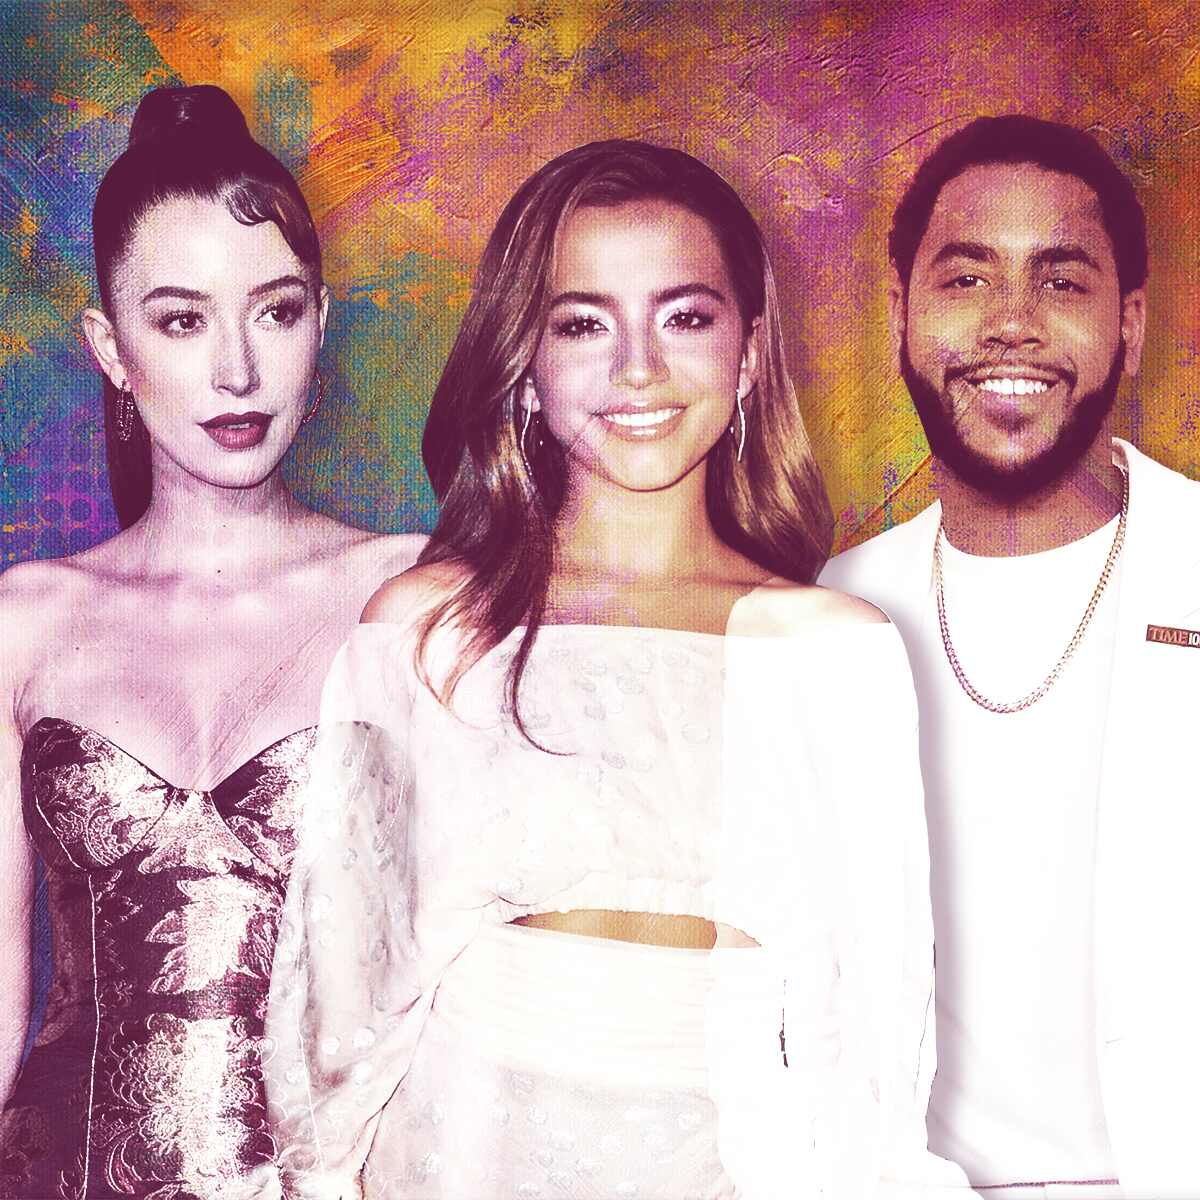 Latinx stars on the rise